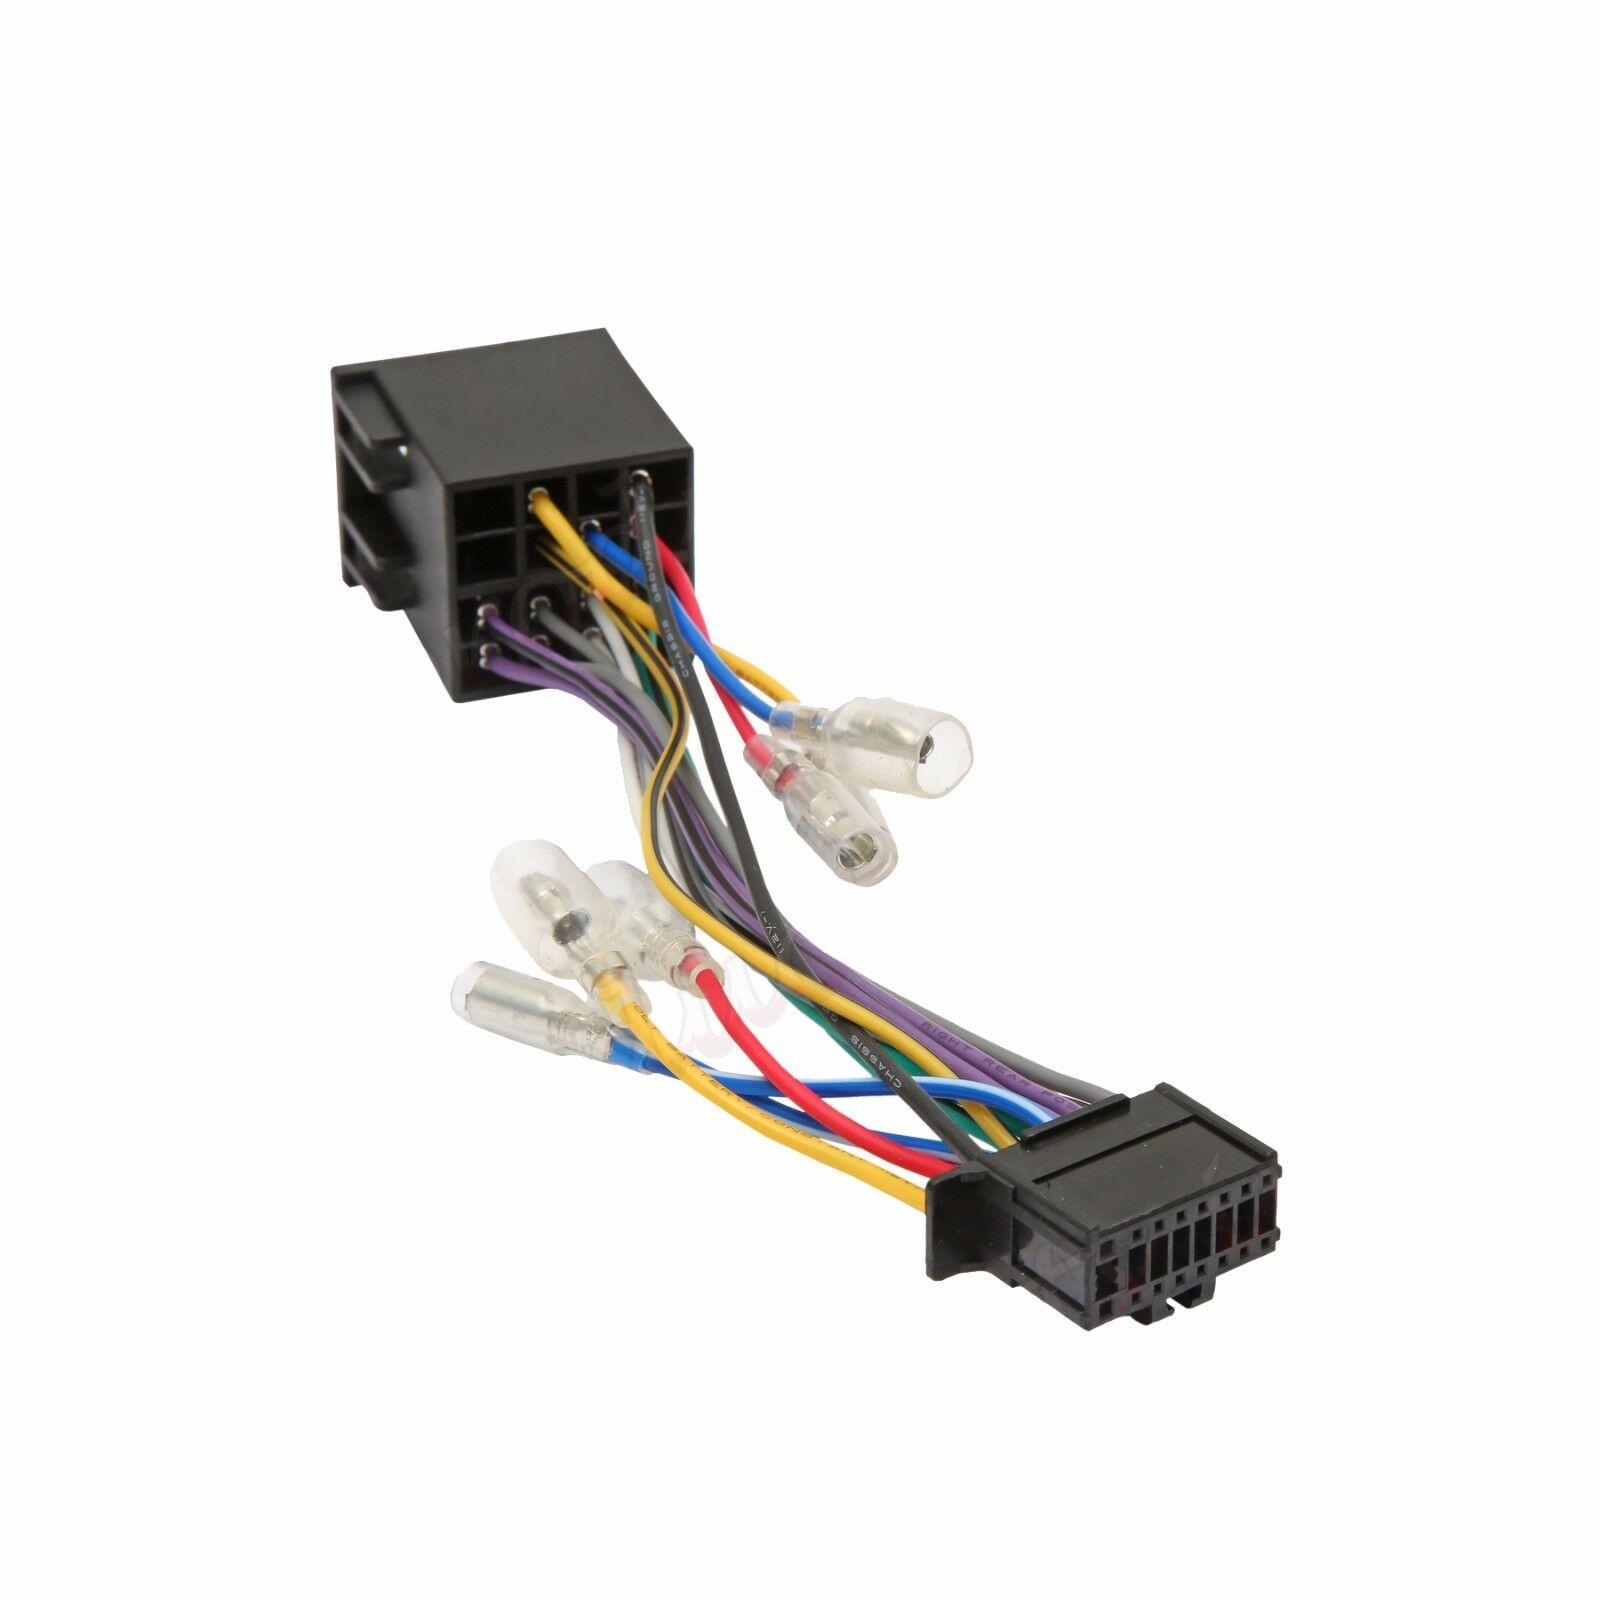 Marvelous Pioneer 16 Pin Iso Wiring Harness Connector Adaptor Car Stereo Radio Wiring Cloud Hemtegremohammedshrineorg